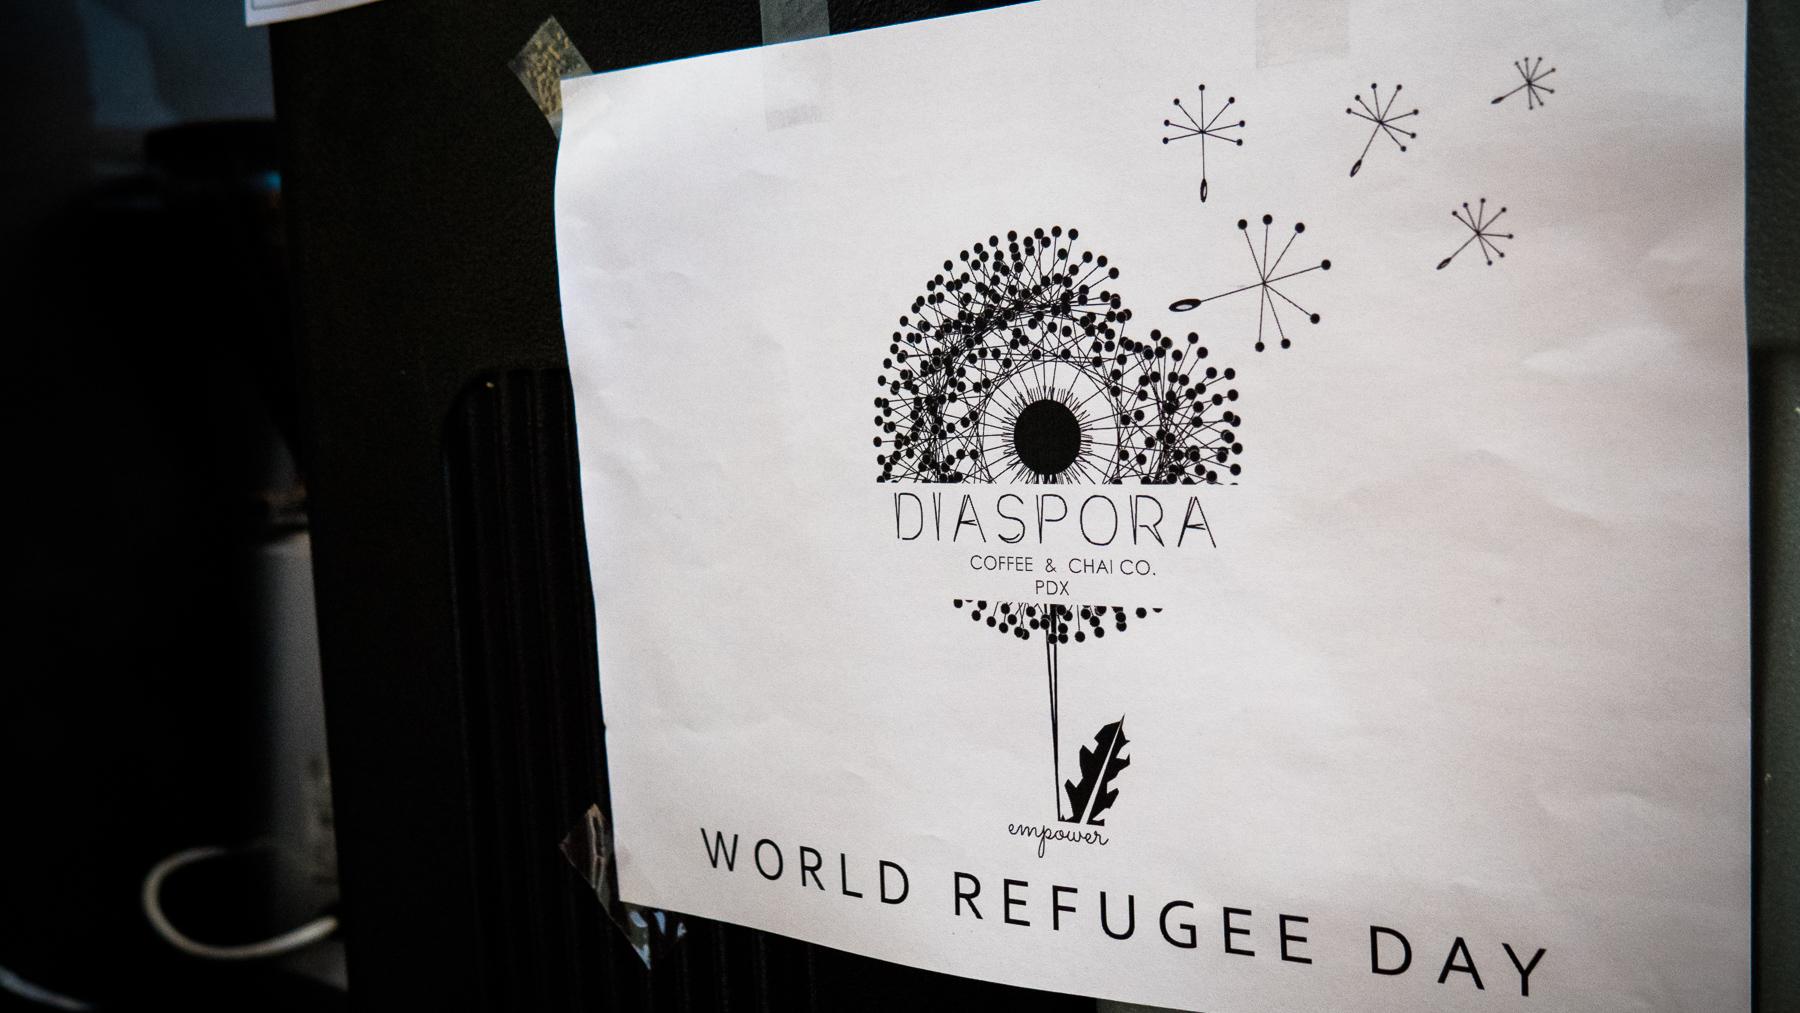 06-worldrefugeeday-8.jpg